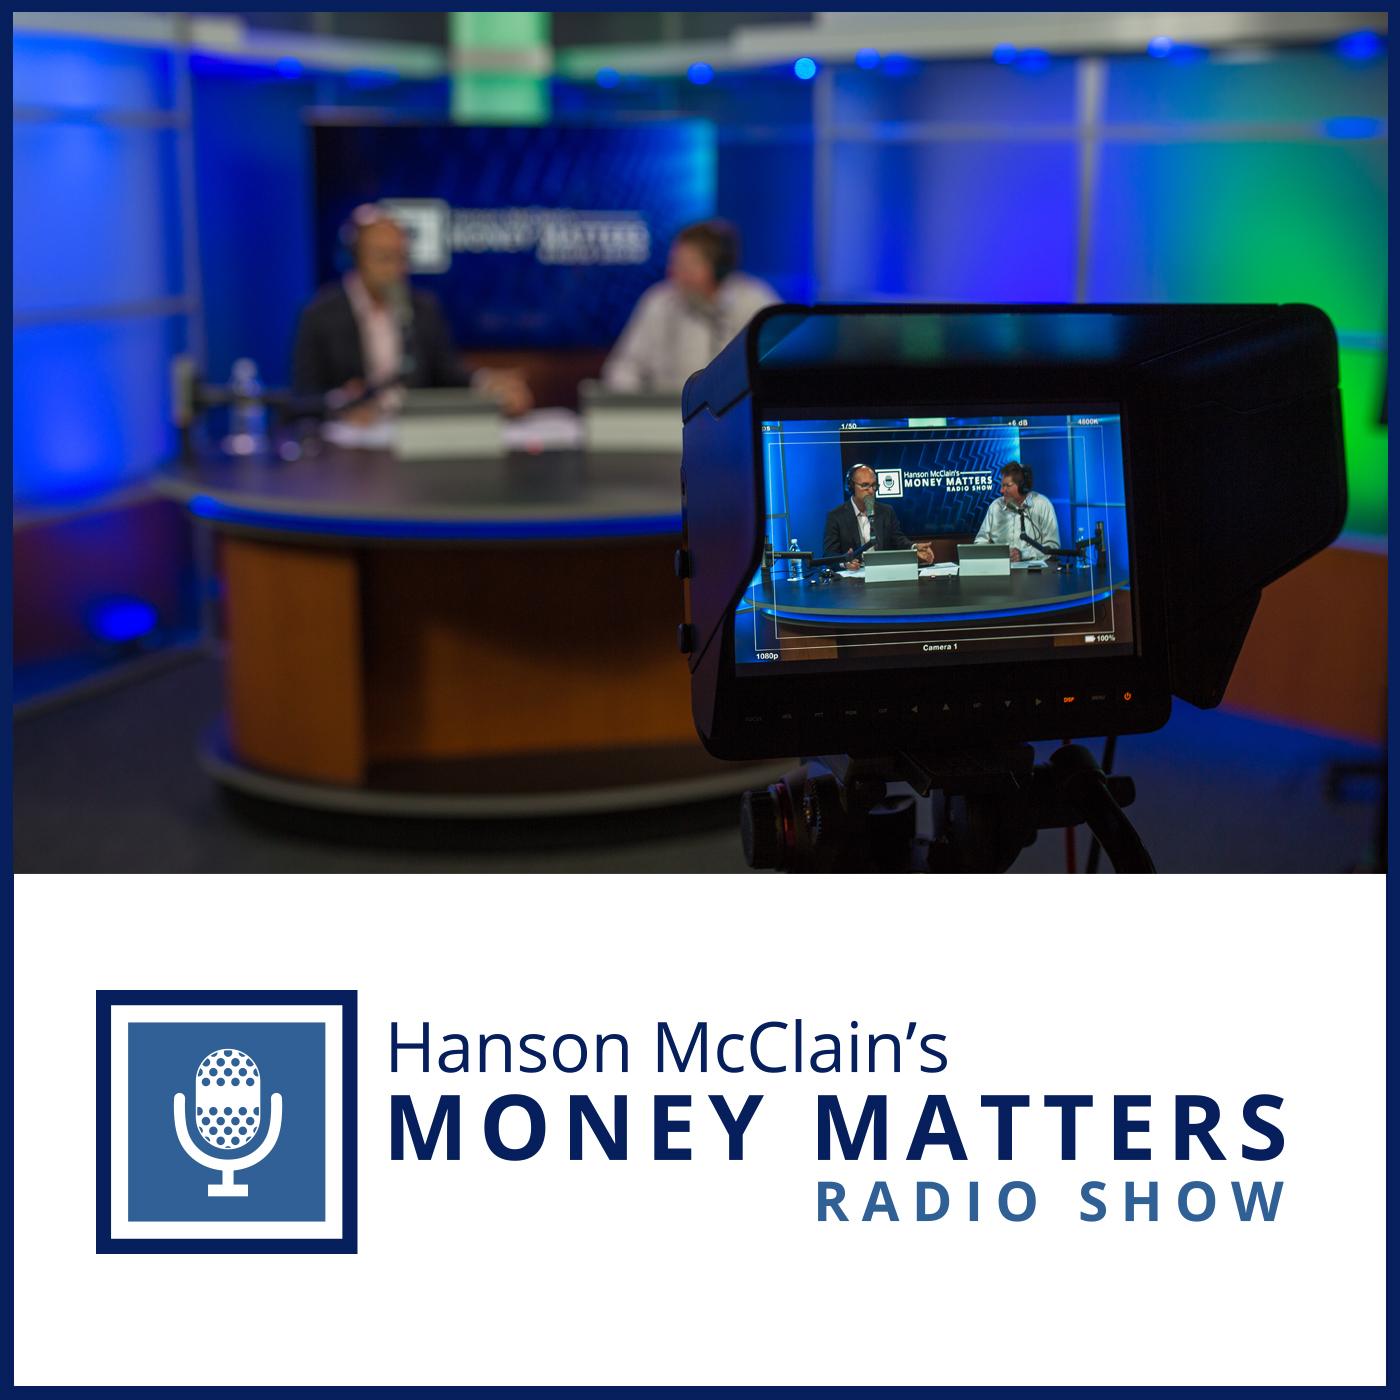 Hanson McClain's Money Matters